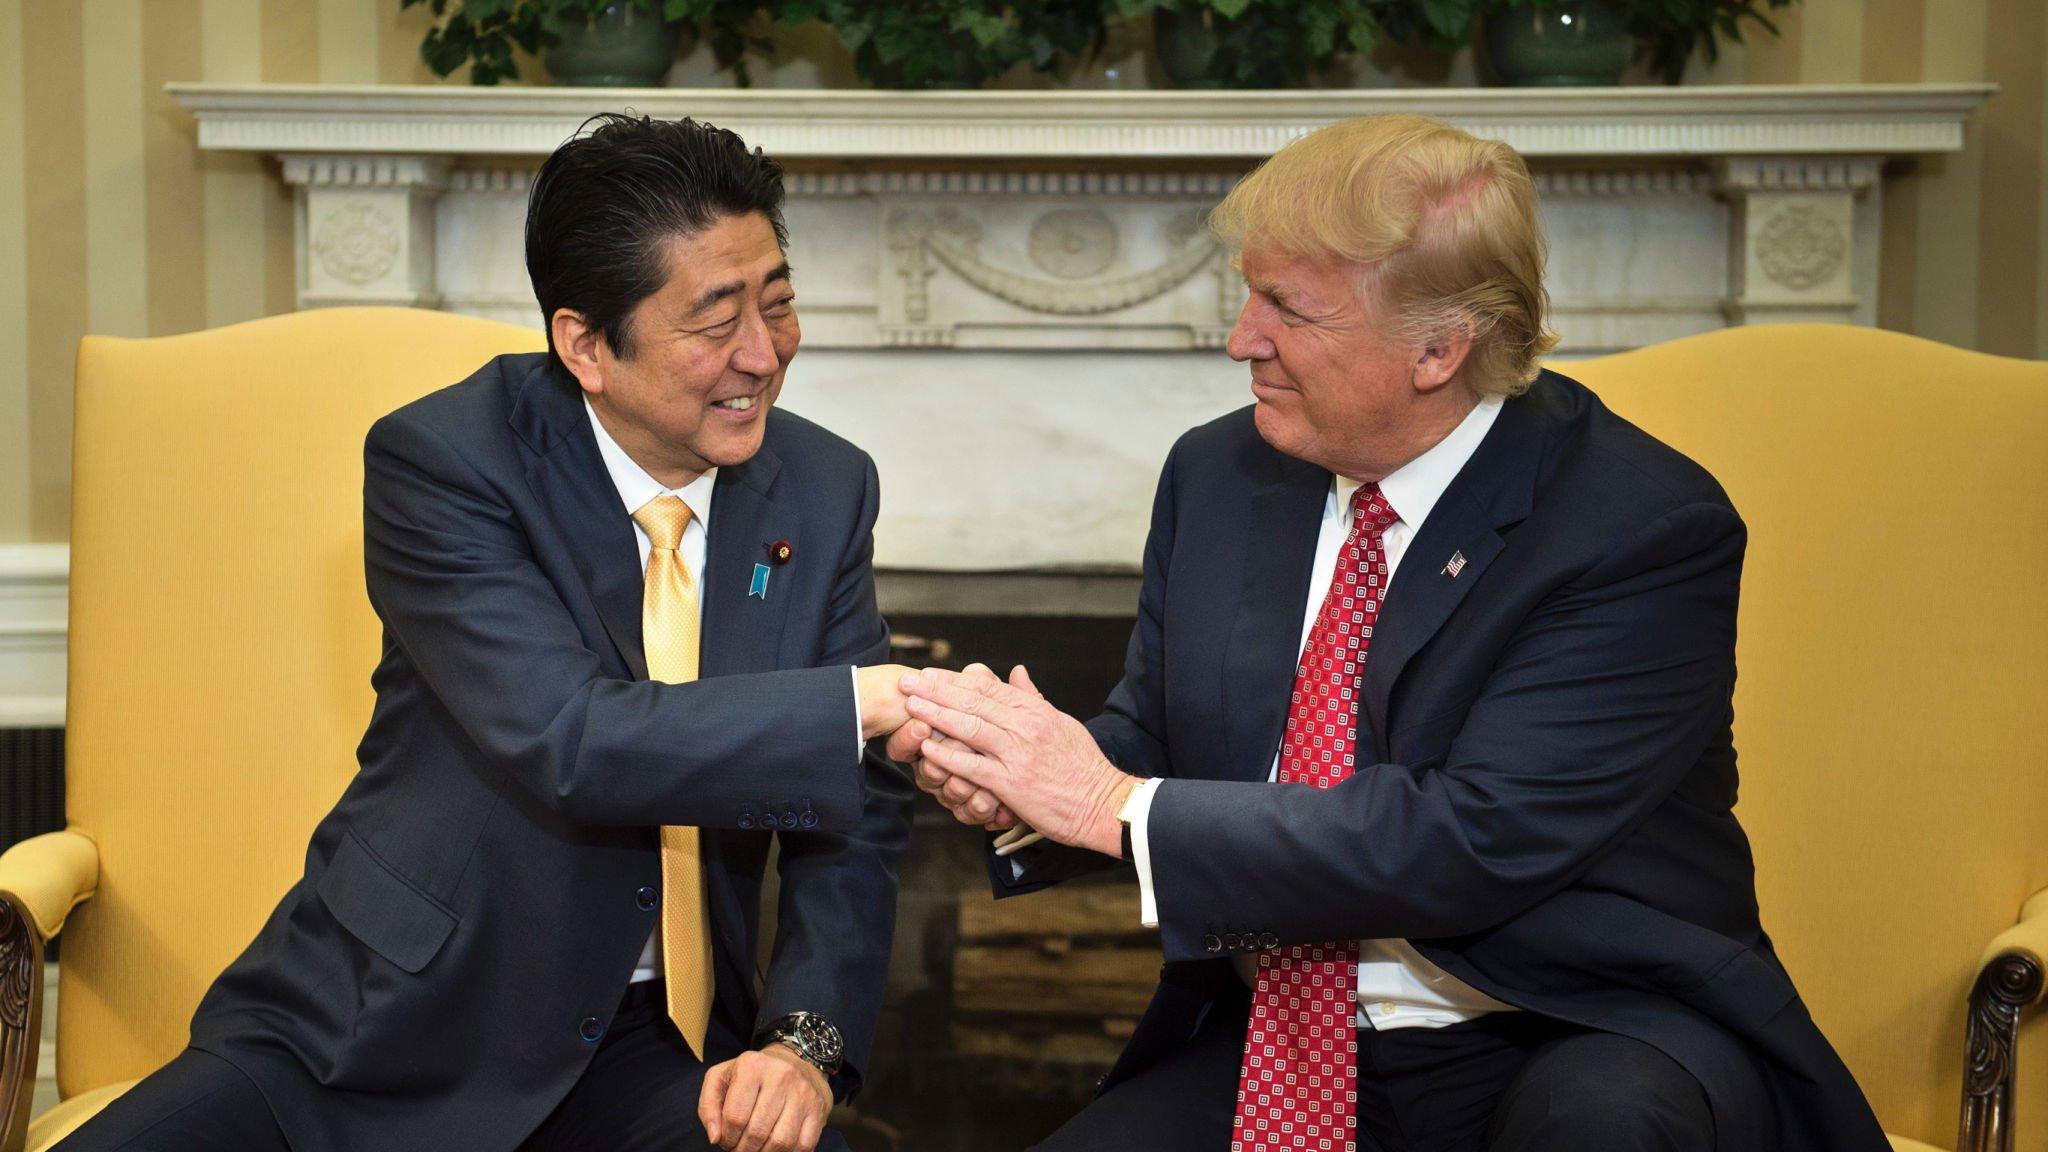 Трамп поздравил Синдзо Абэ спобедой навыборах впарламент